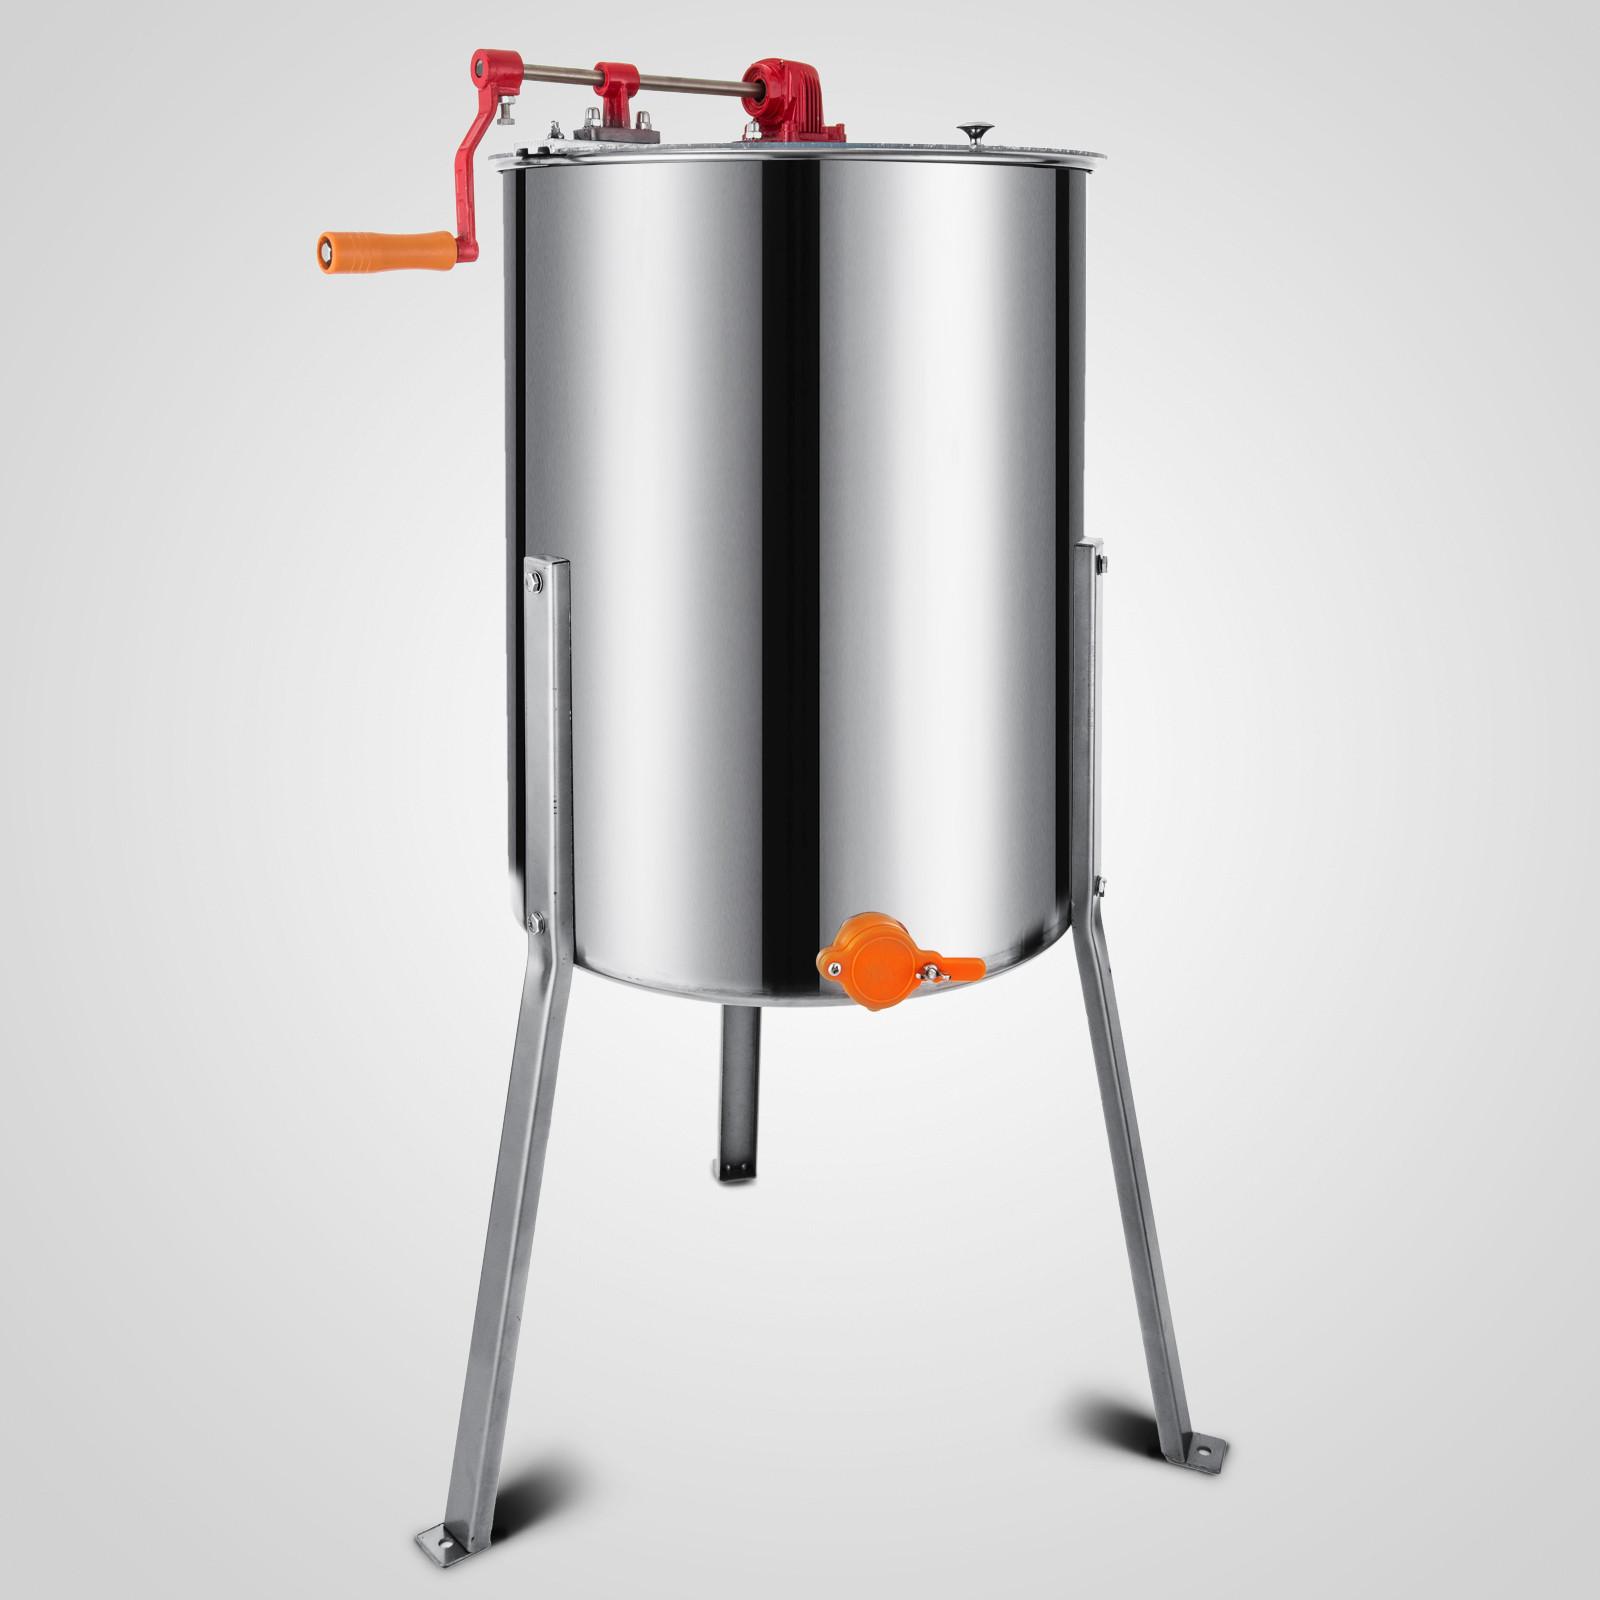 Extracteur-de-Miel-Electrique-manuelle-2-3-4-Cadres-En-Acier-Inox-Centrifugeuse miniature 78